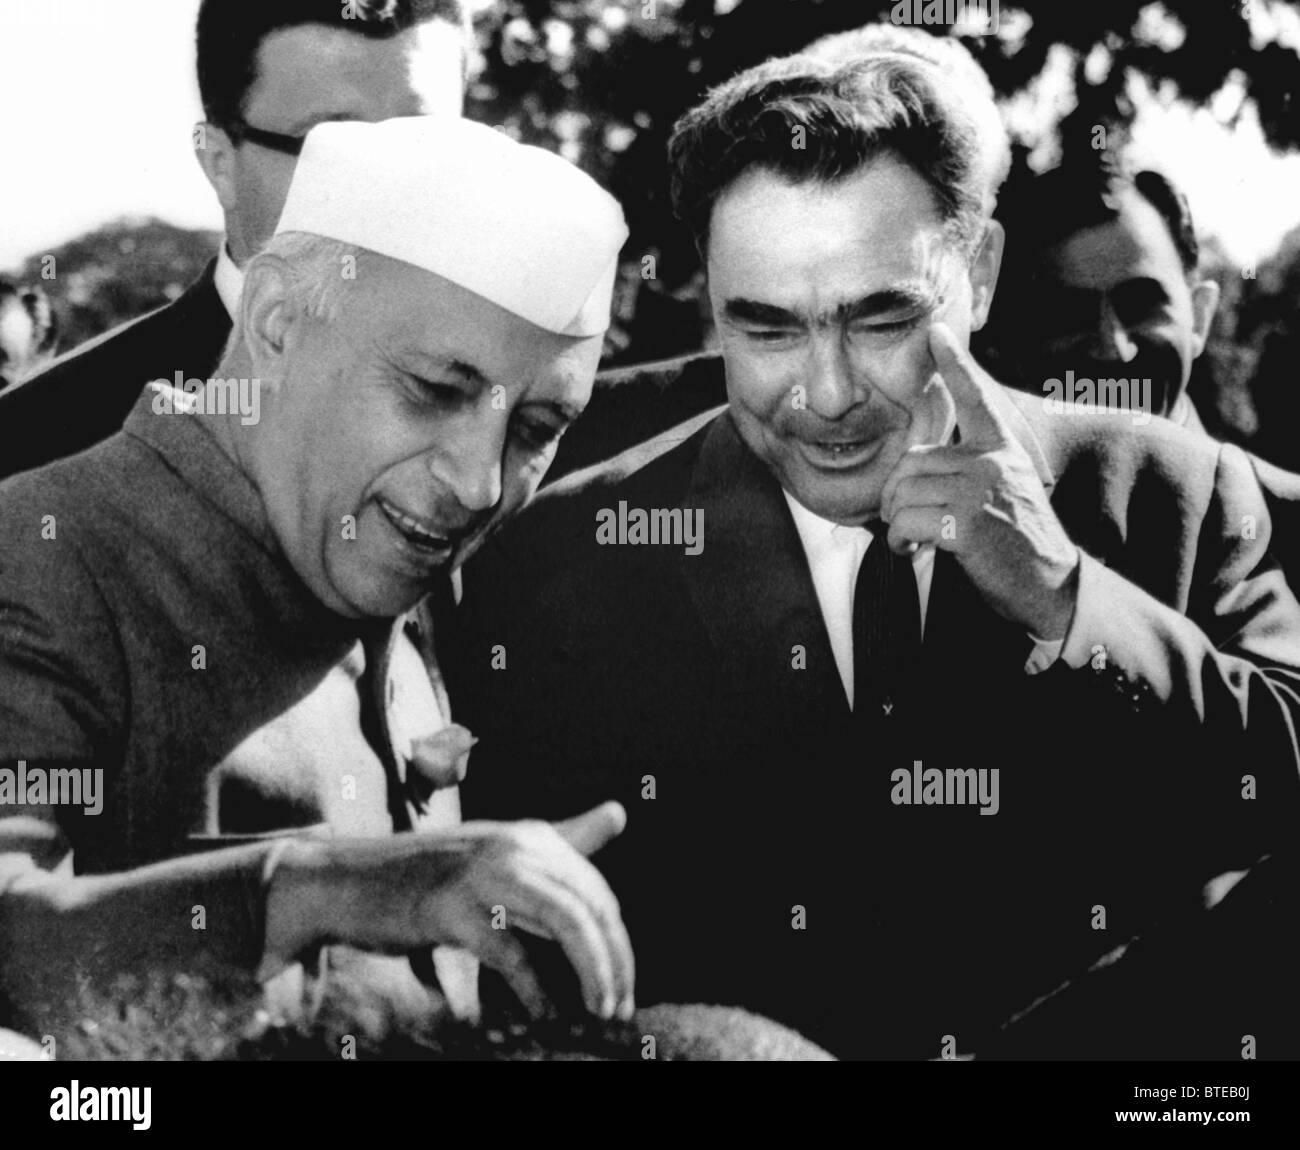 Chairman of Presidium of Supreme Soviet of USSR Leonid Brezhnev and Prime Minister of India Jawaharlal Nehru, 1962 - Stock Image